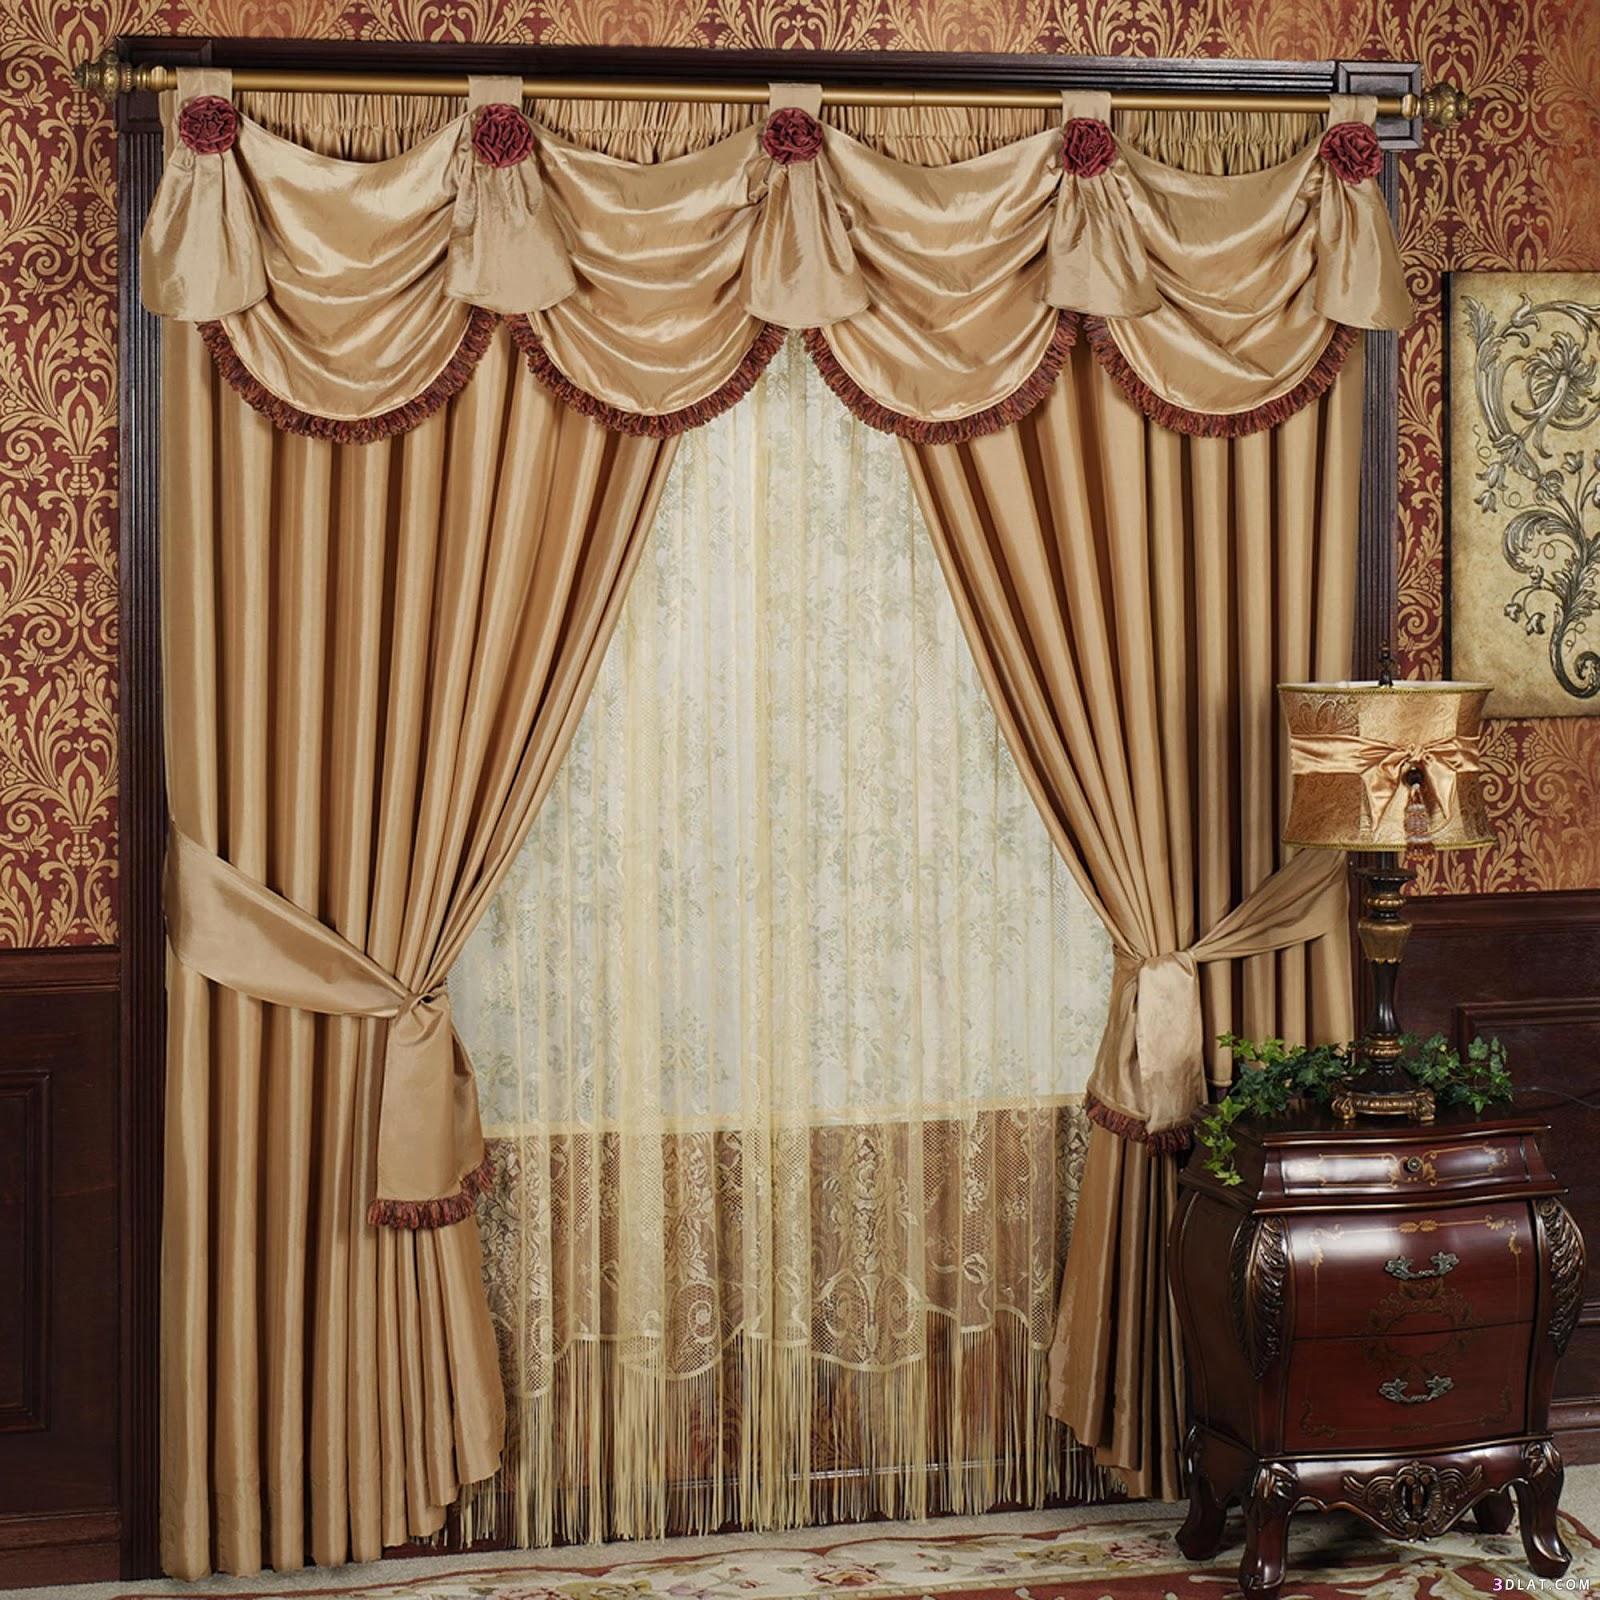 http://hawk-haven.com/wp-content/uploads/2016/12/living-room-curtains-photo-14.jpg